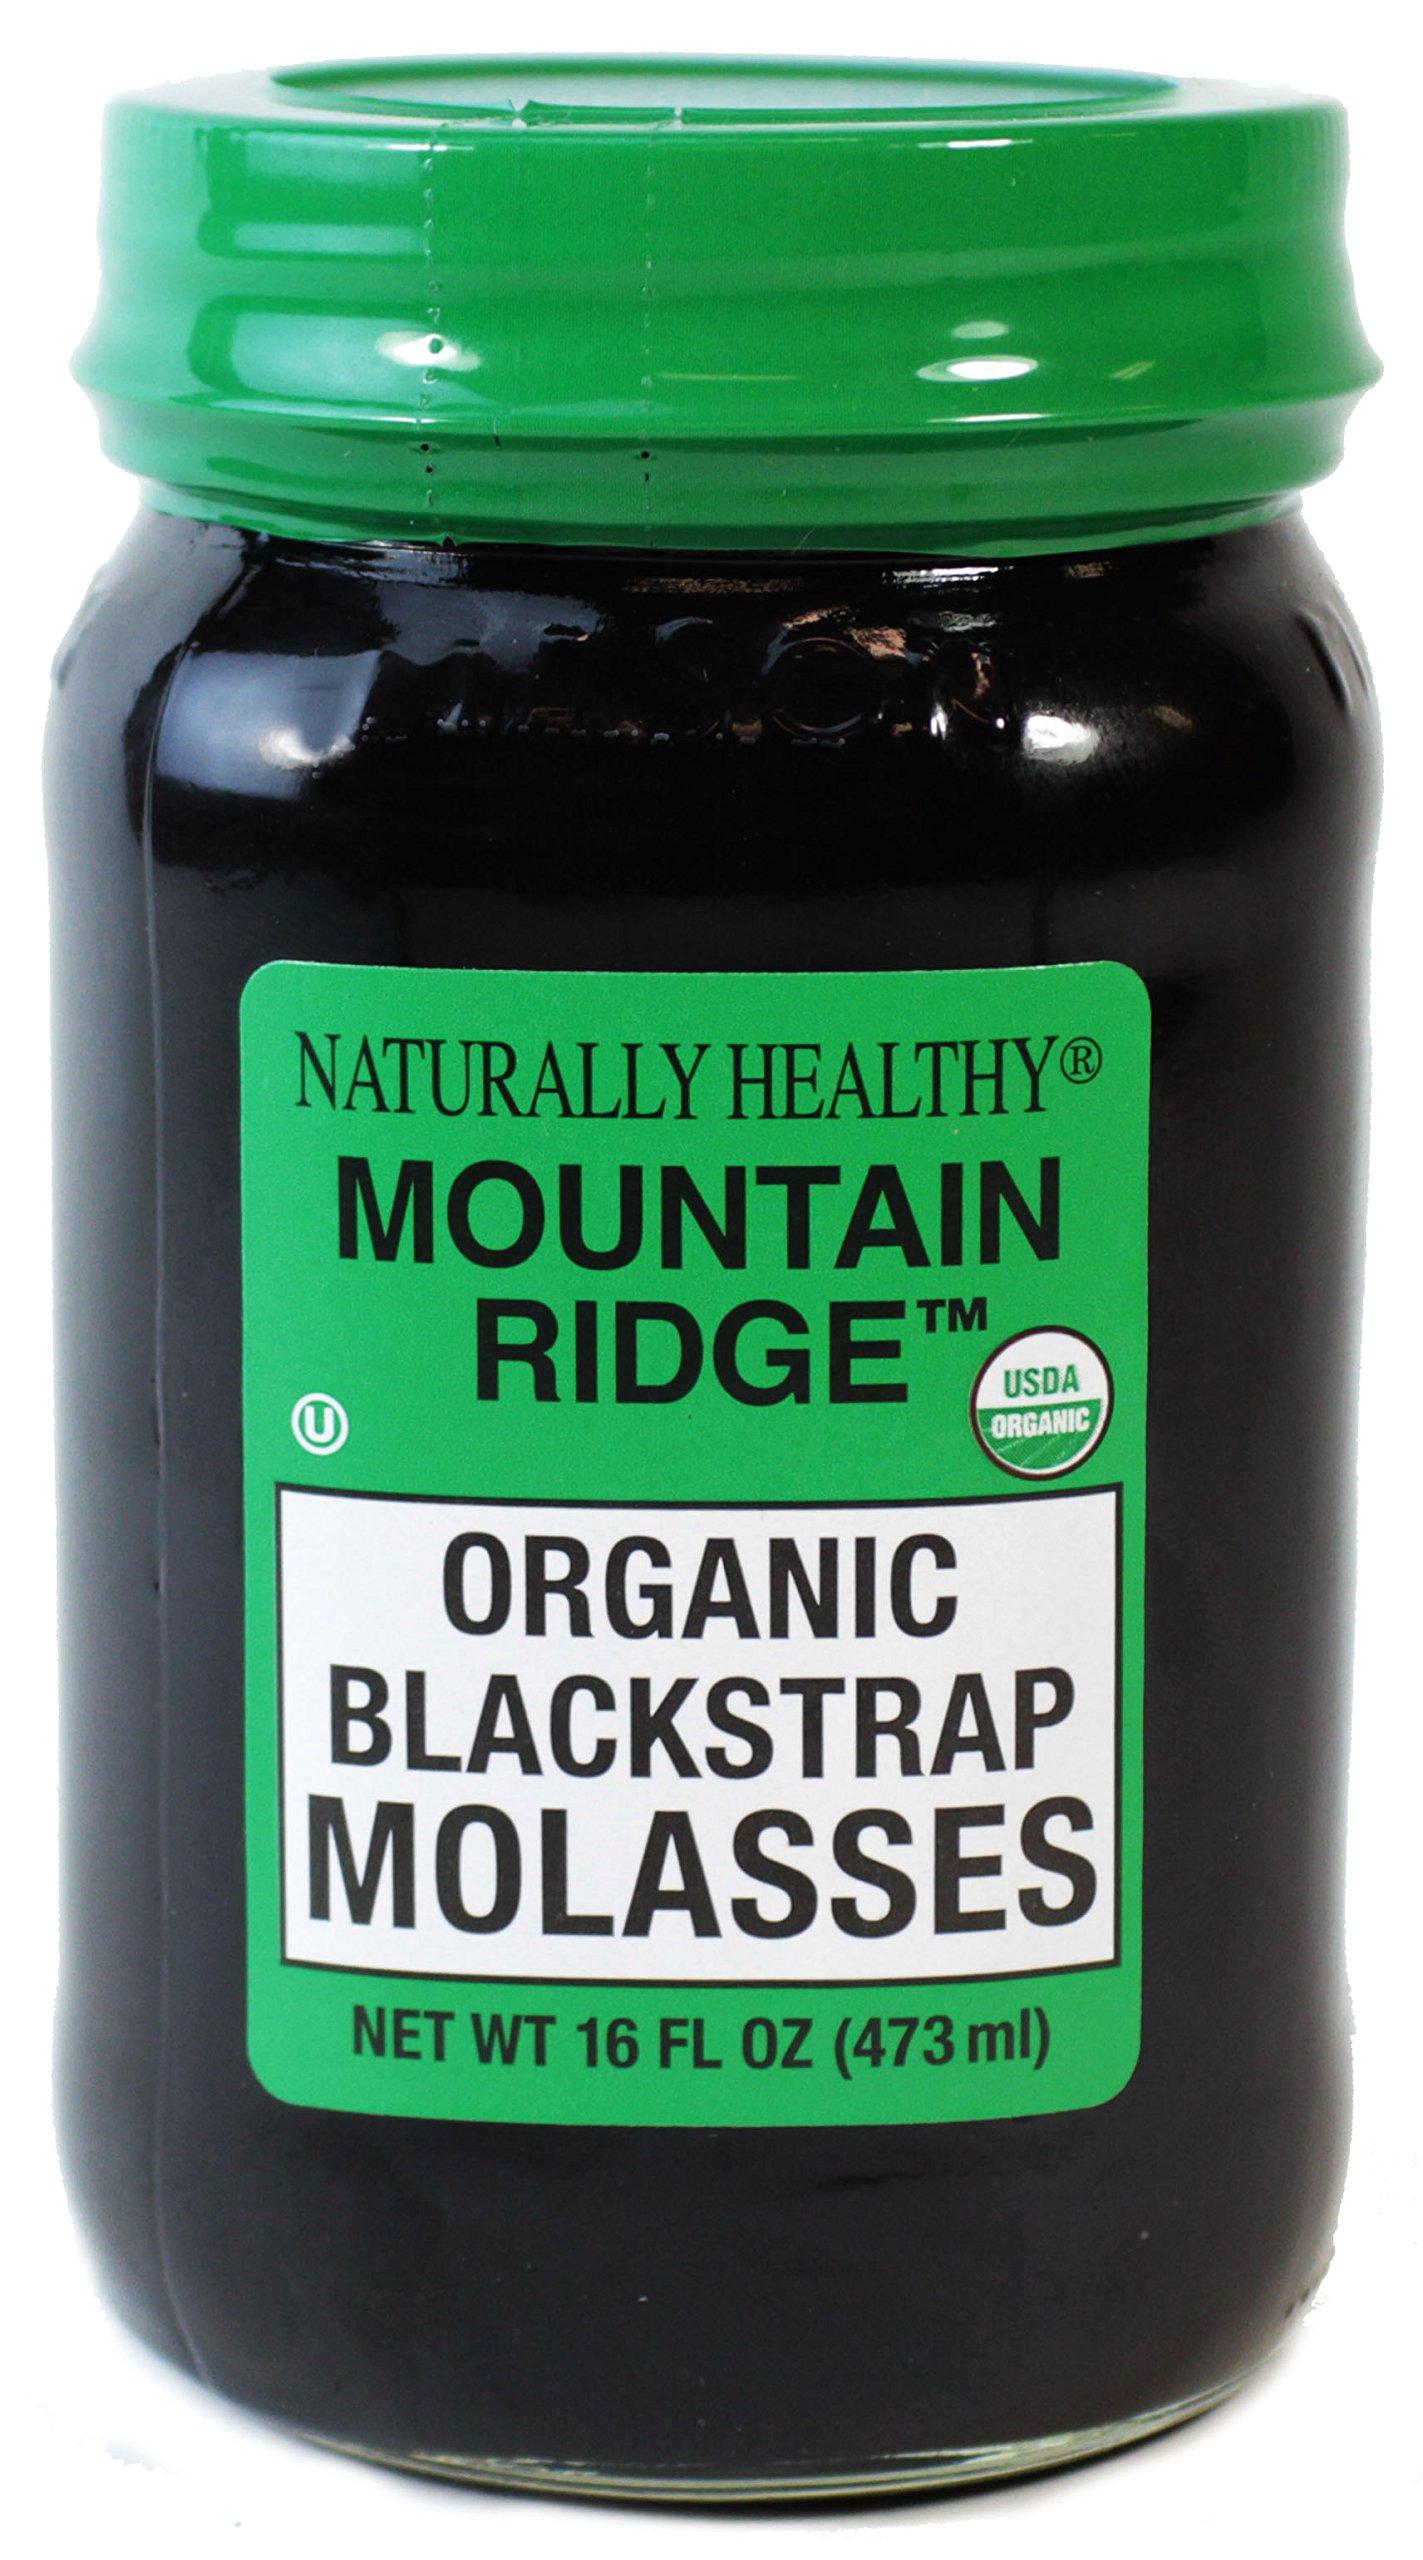 MOUNTAIN RIDGE Naturally Healthy USDA Organic Blackstrap Molasses, 16 Fl Oz Glass Mason Jar